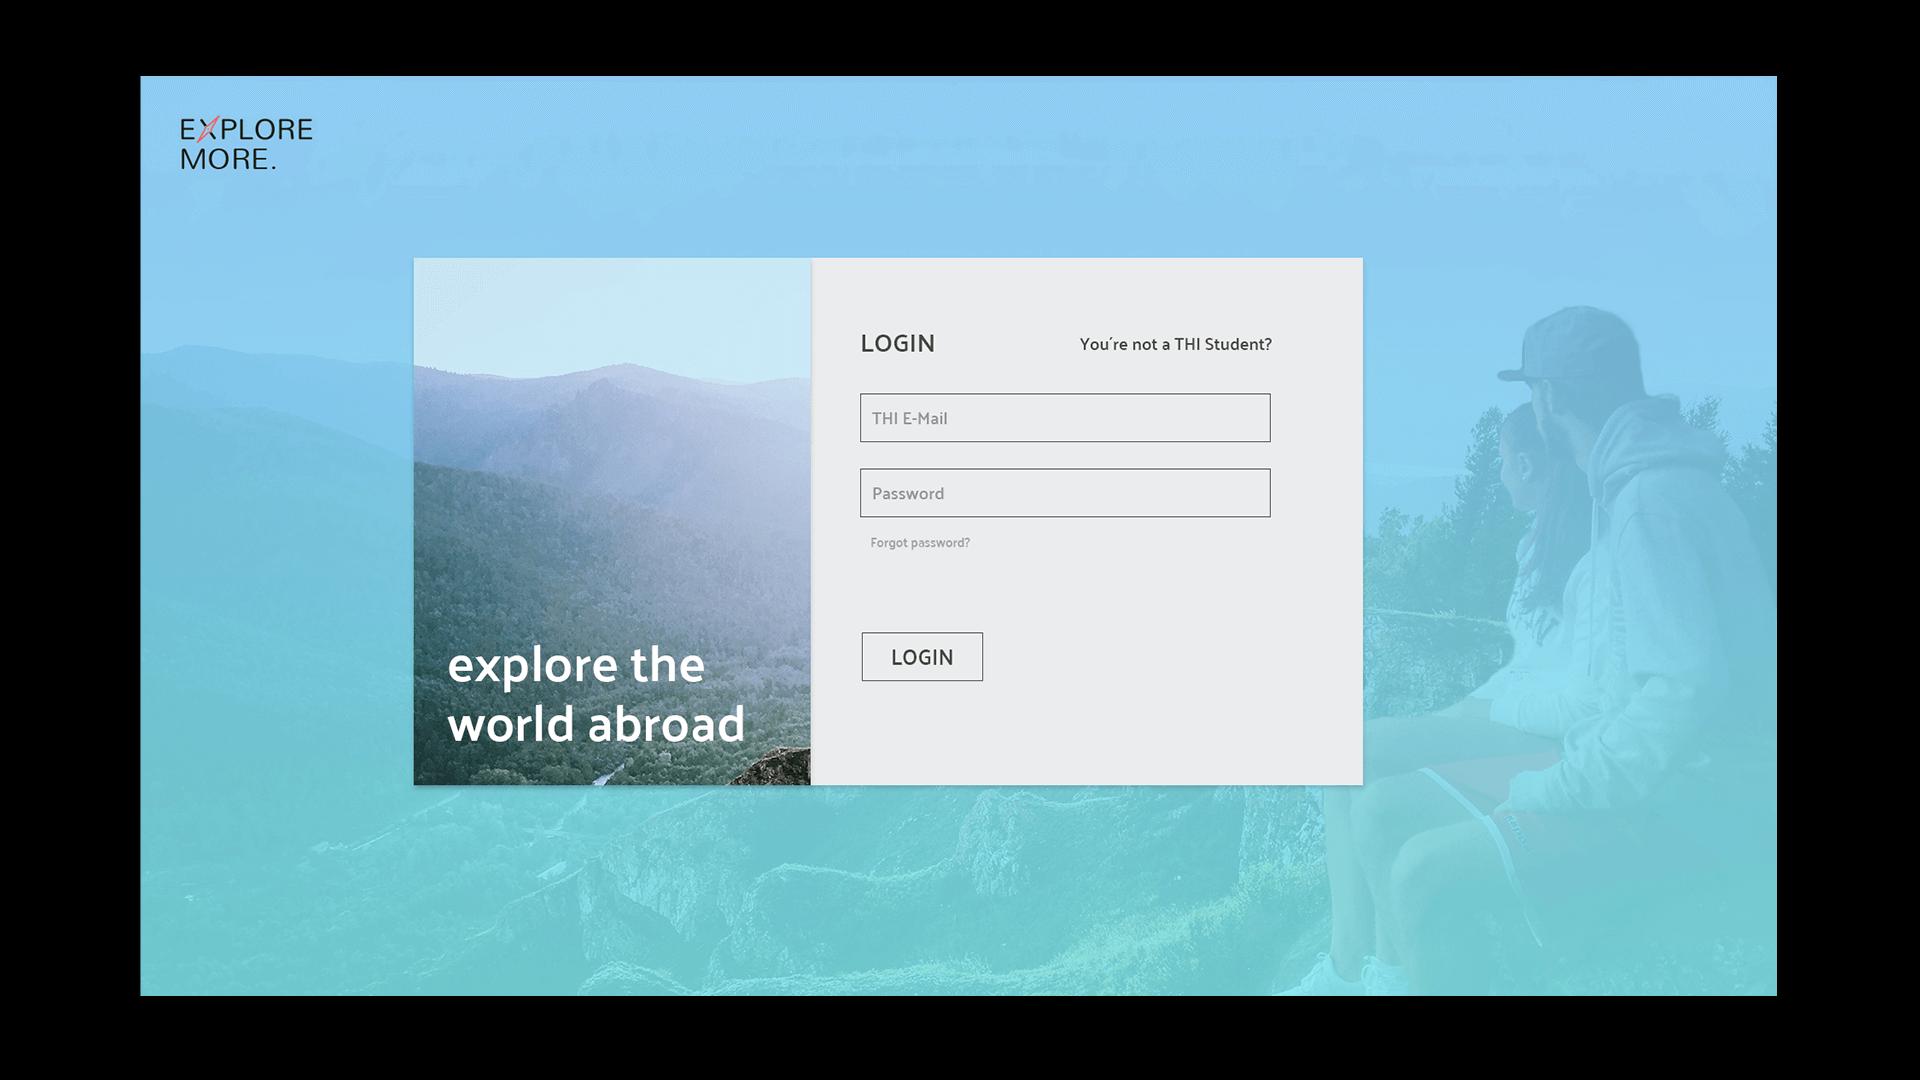 explore_more_uebersicht_4